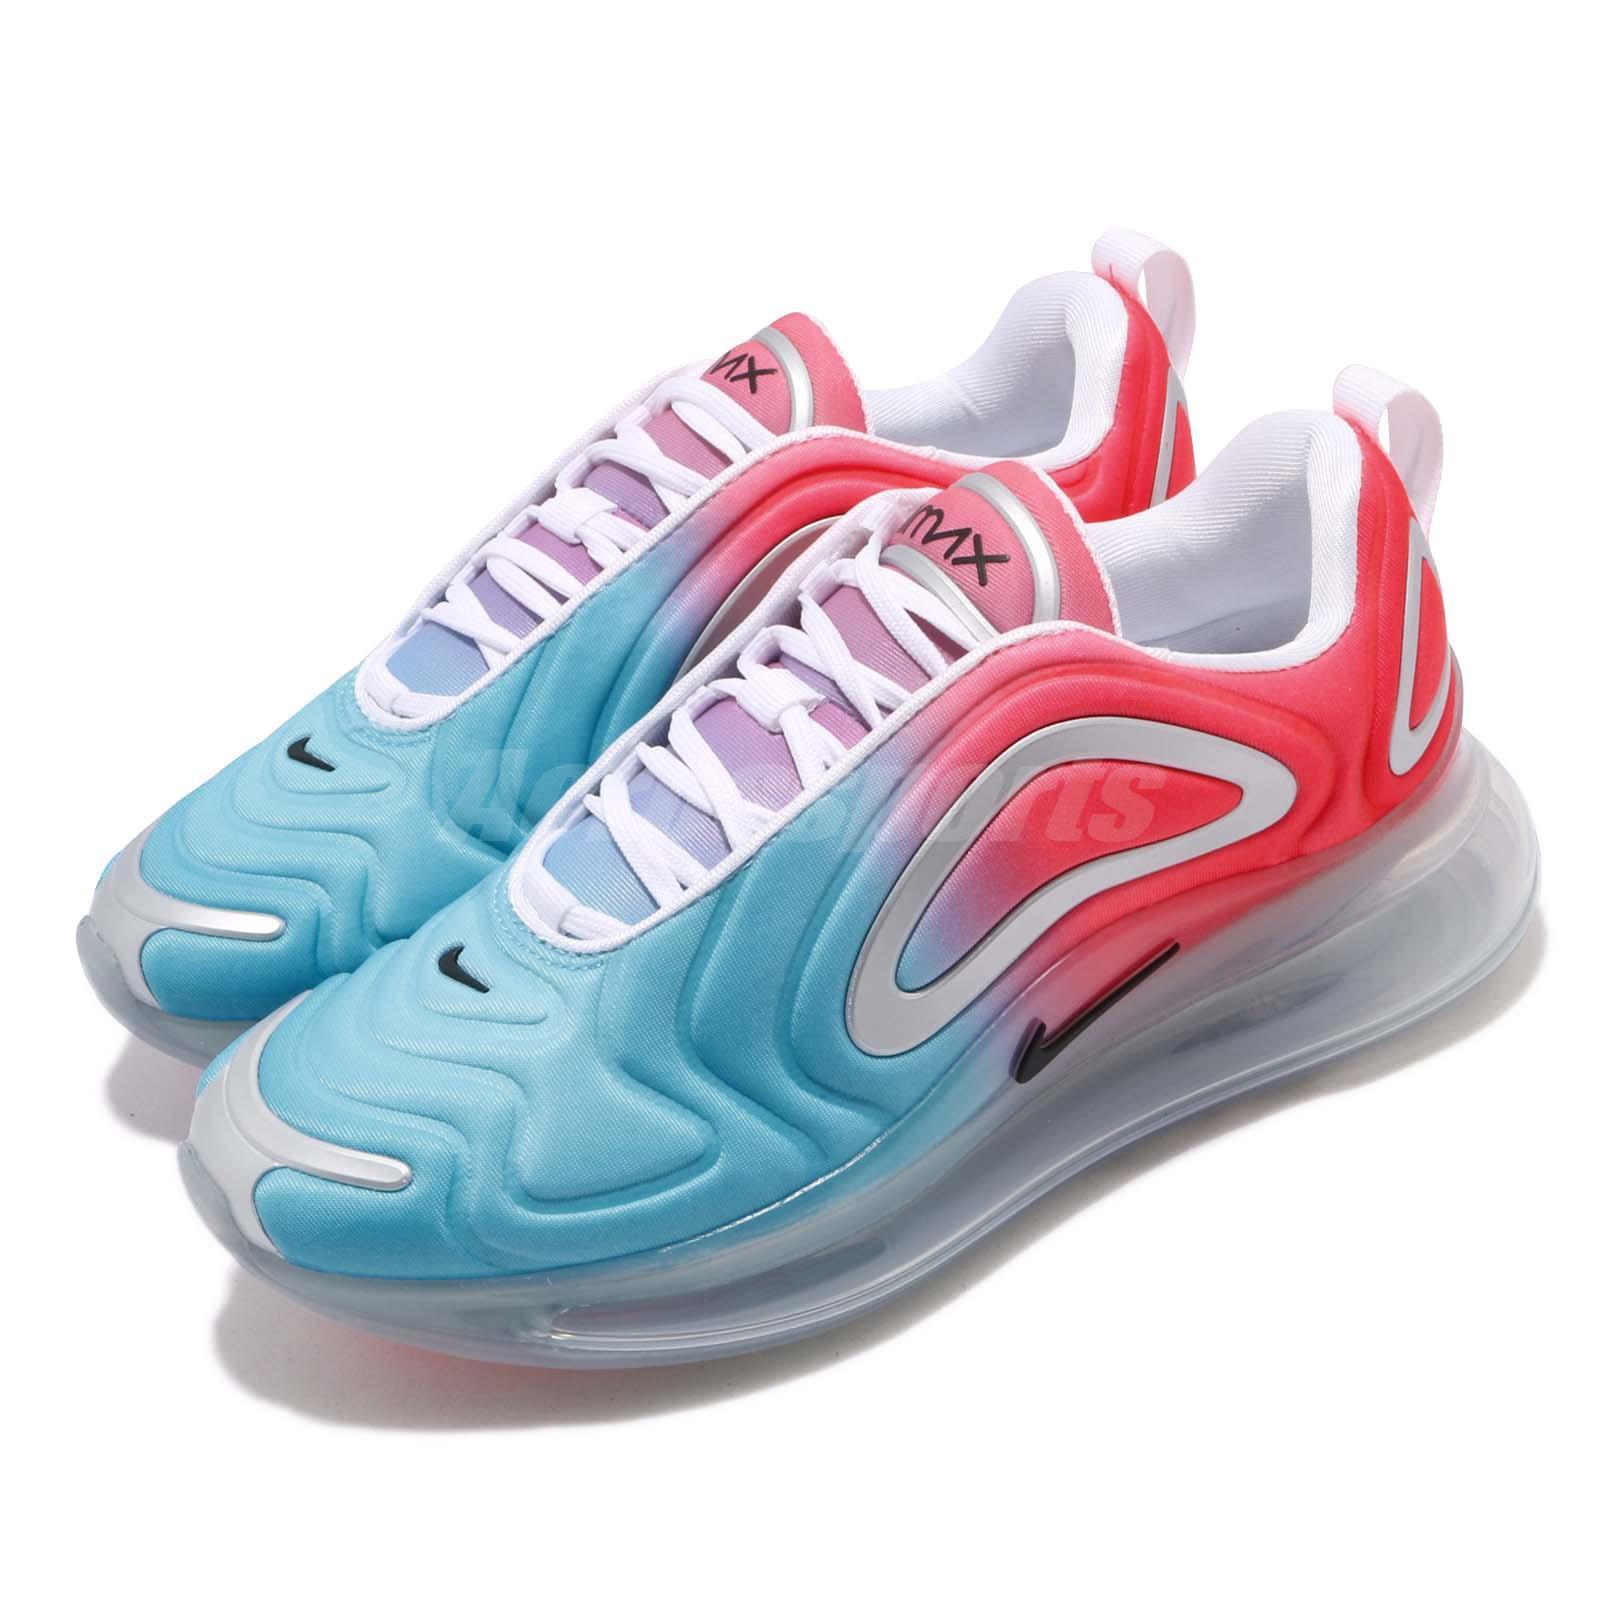 Nike WMNS Air Max 720 Pink Sea AR9293_600 Chaussures NIke